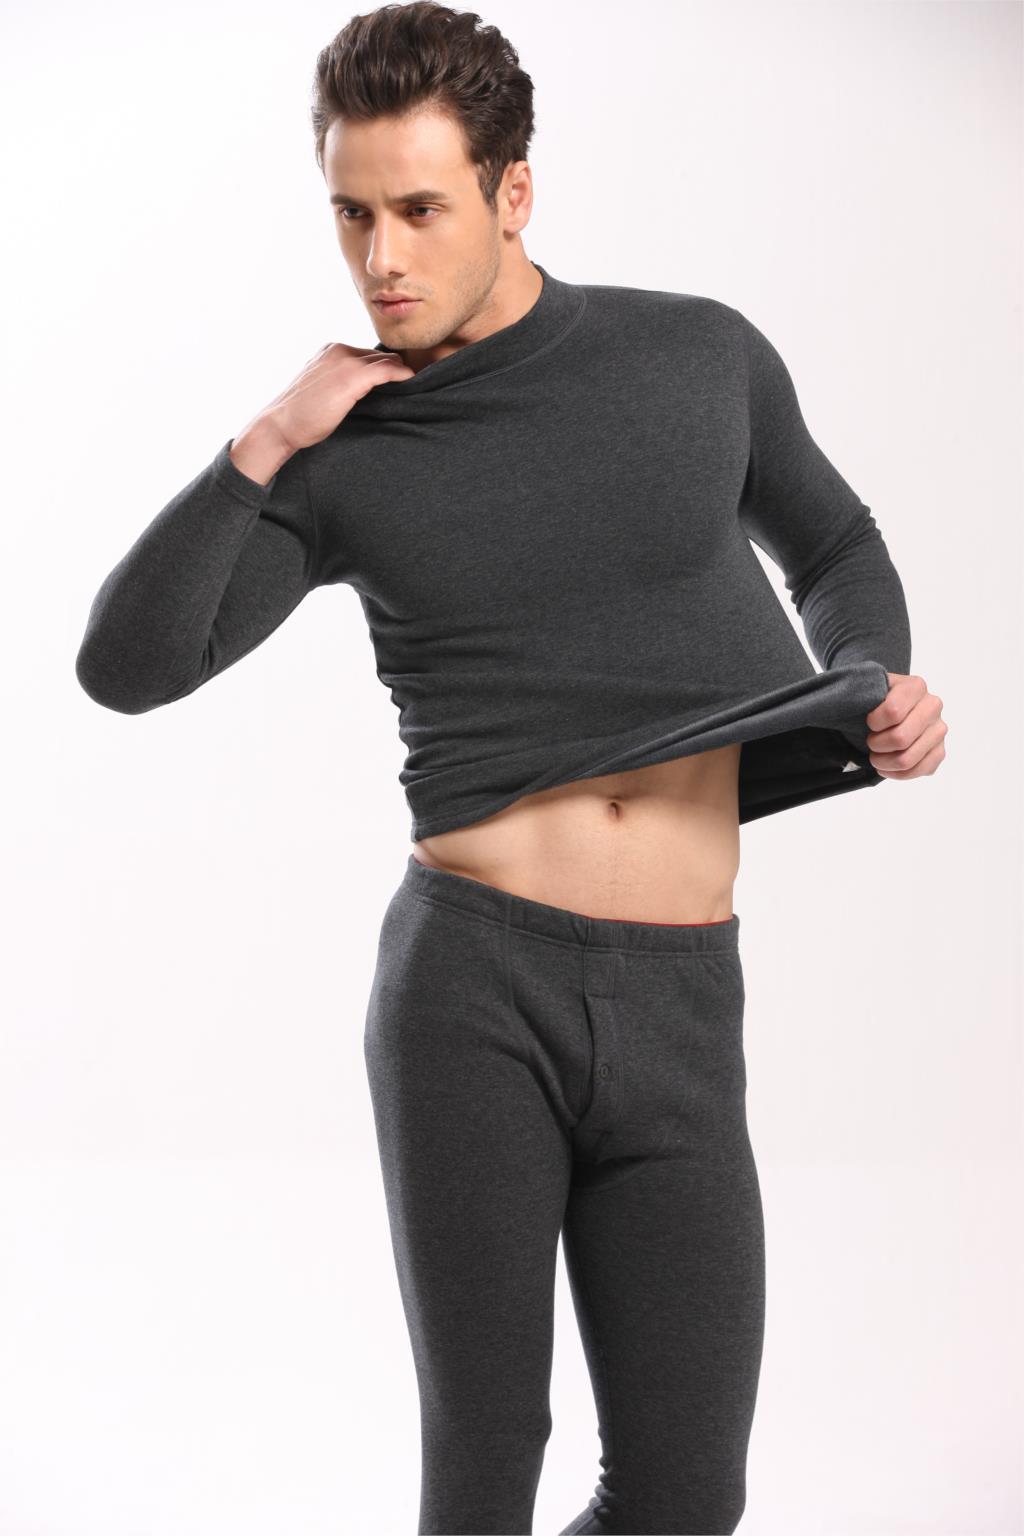 Zerlos biancheria spessore pantaloni 13